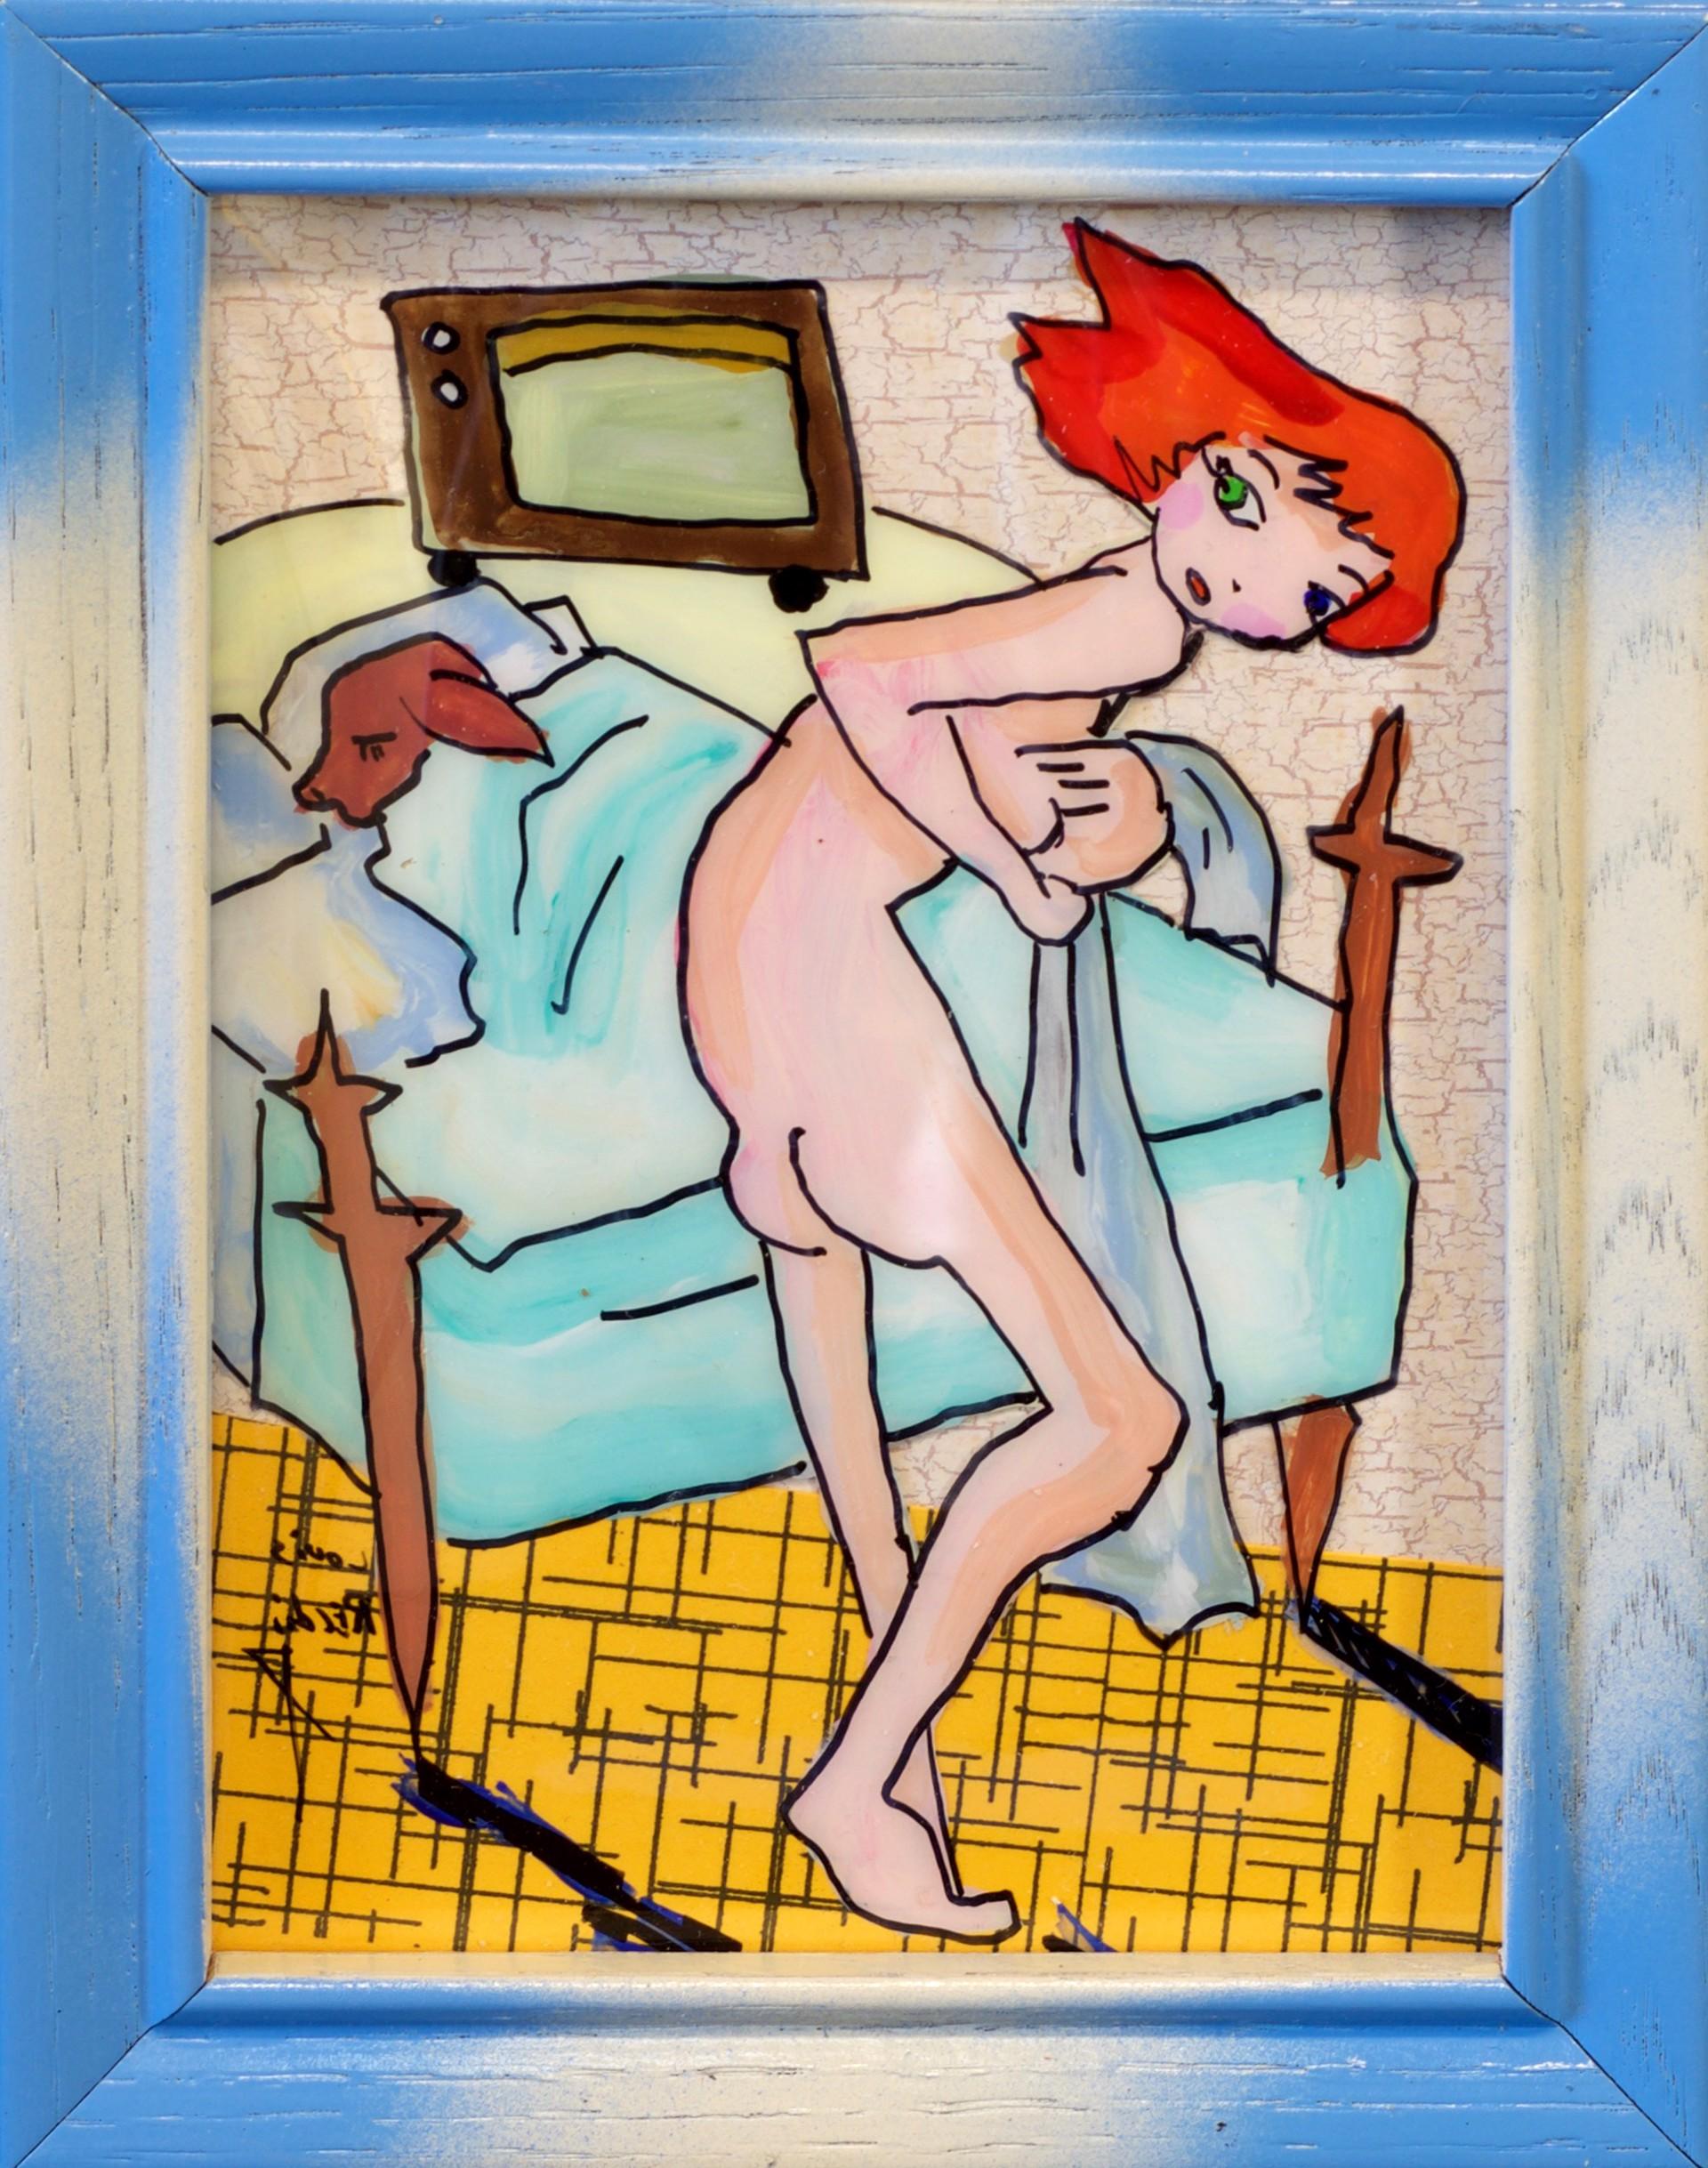 The Getaway by Louis Recchia